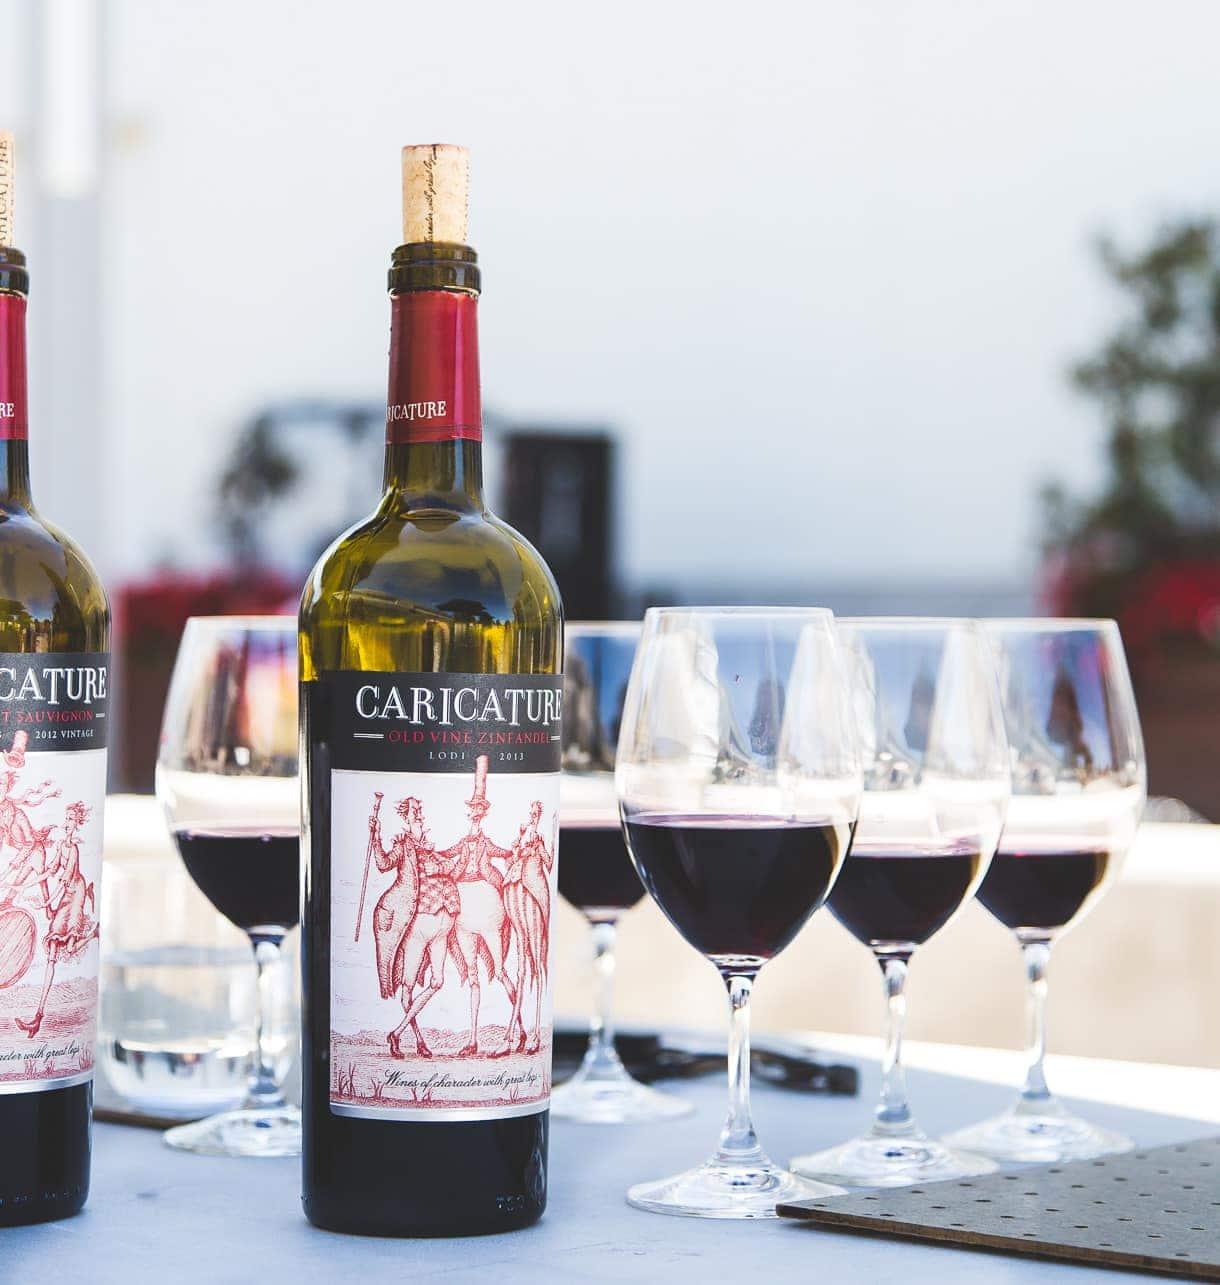 Caricature Wine by Lange Twins Family Vineyard {Lodi, California}